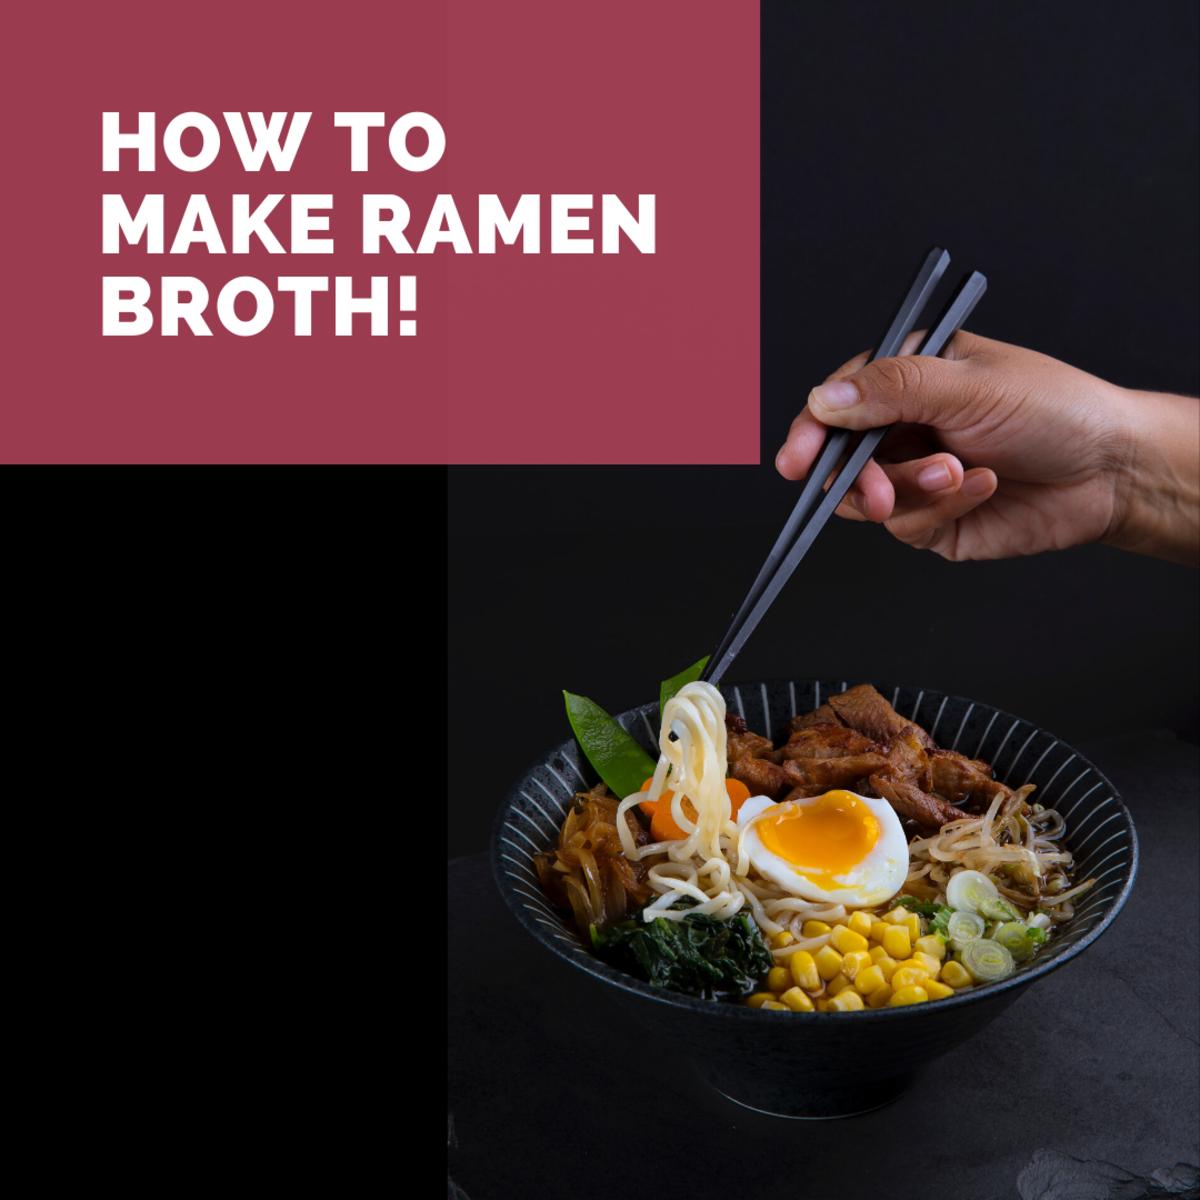 How to Make Ramen Broth